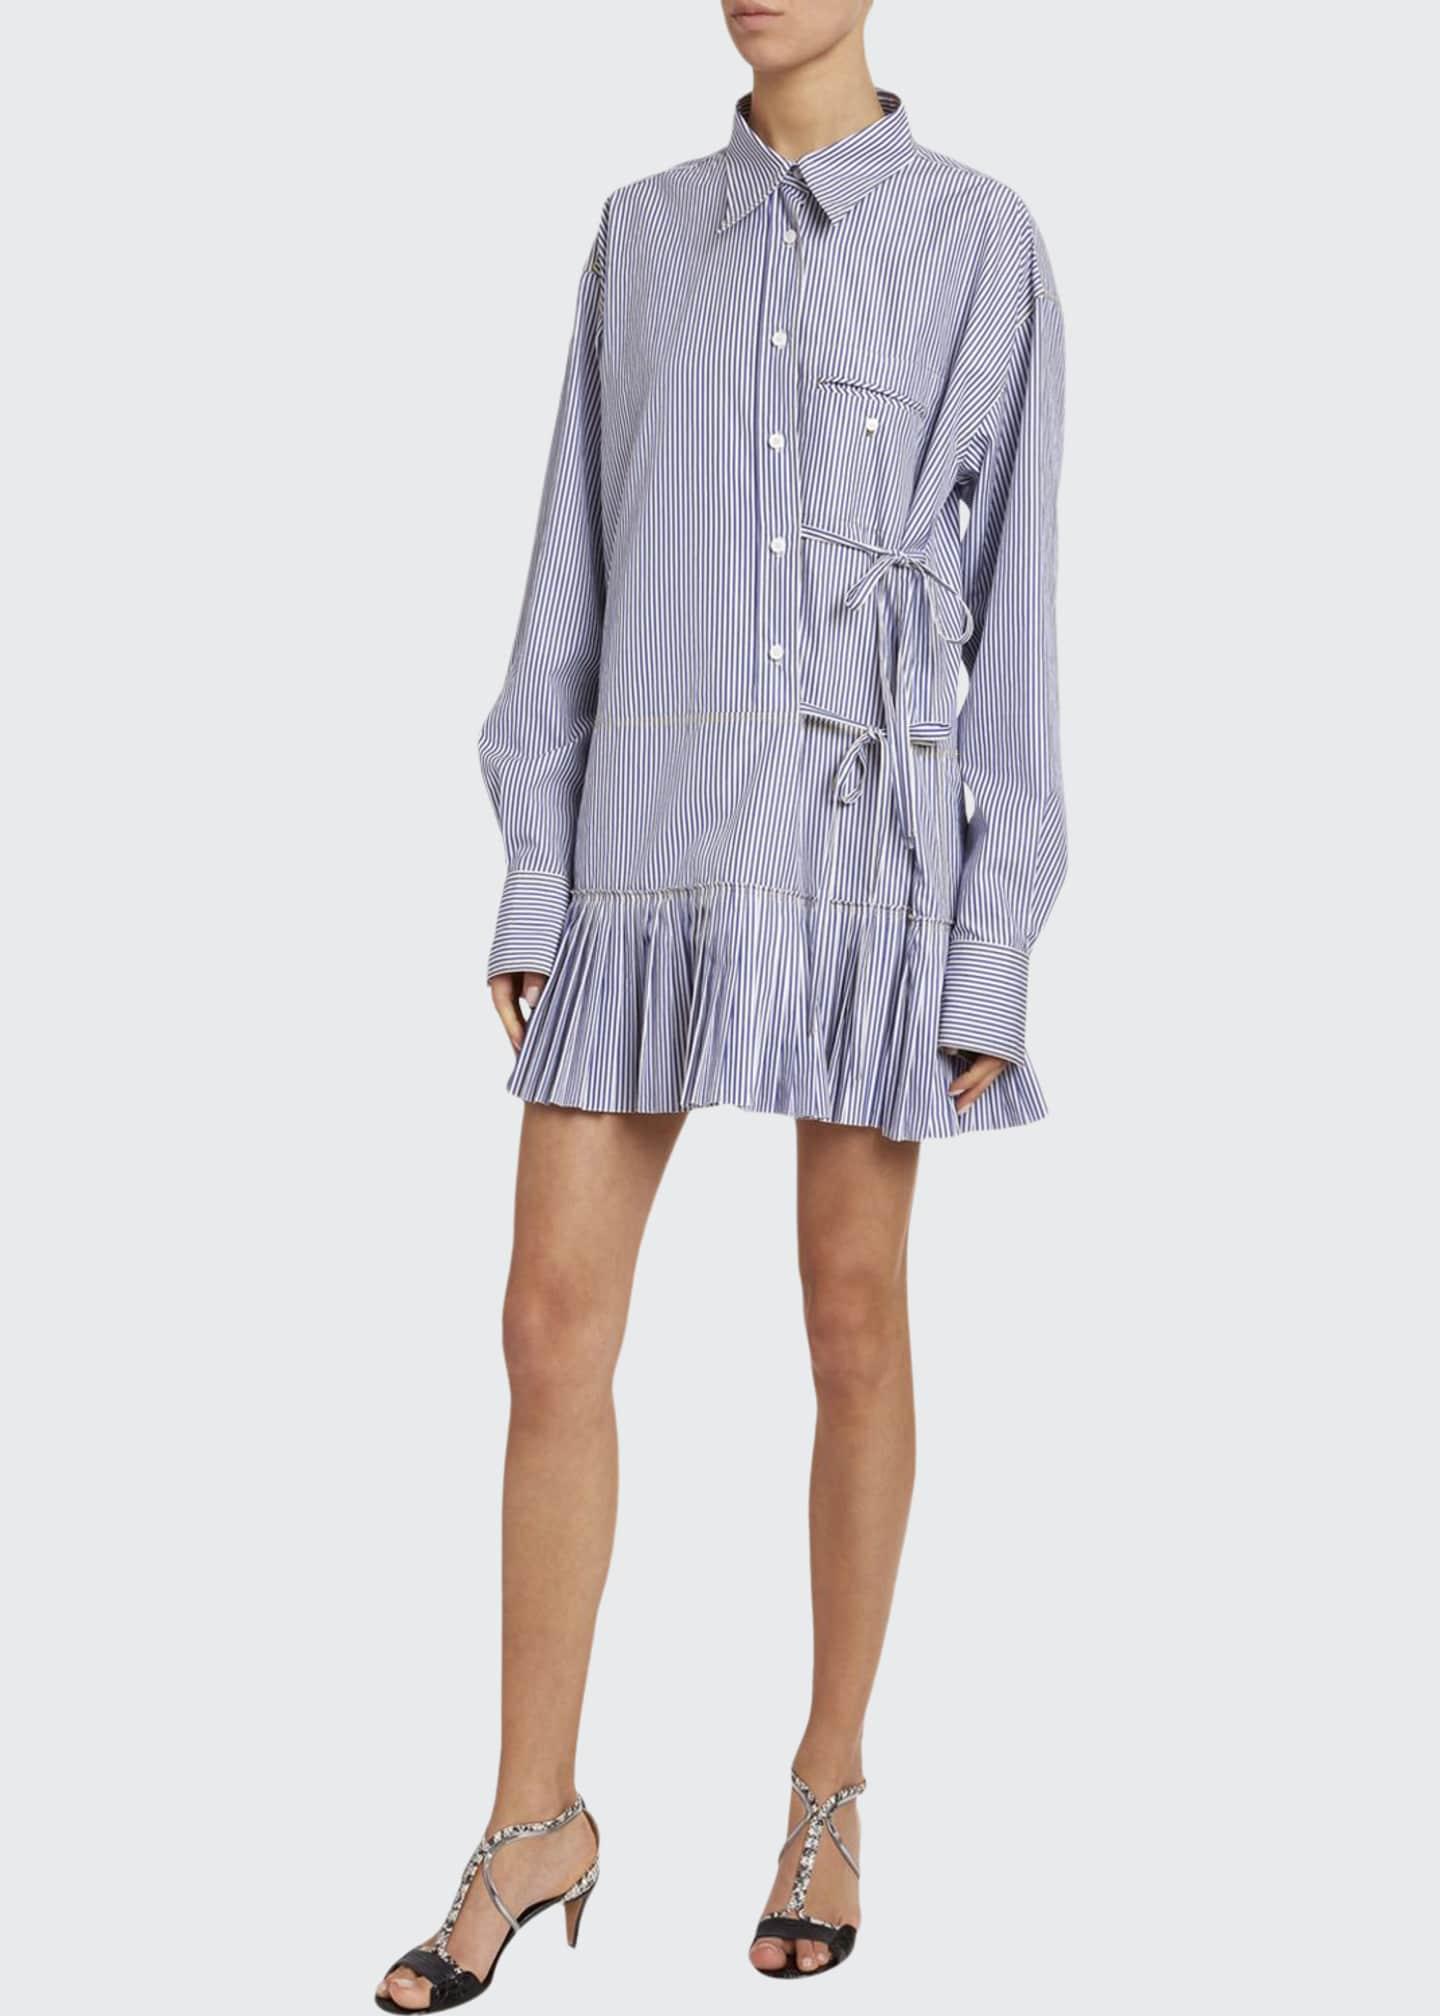 Chloe Striped Poplin Pleated-Hem Dress